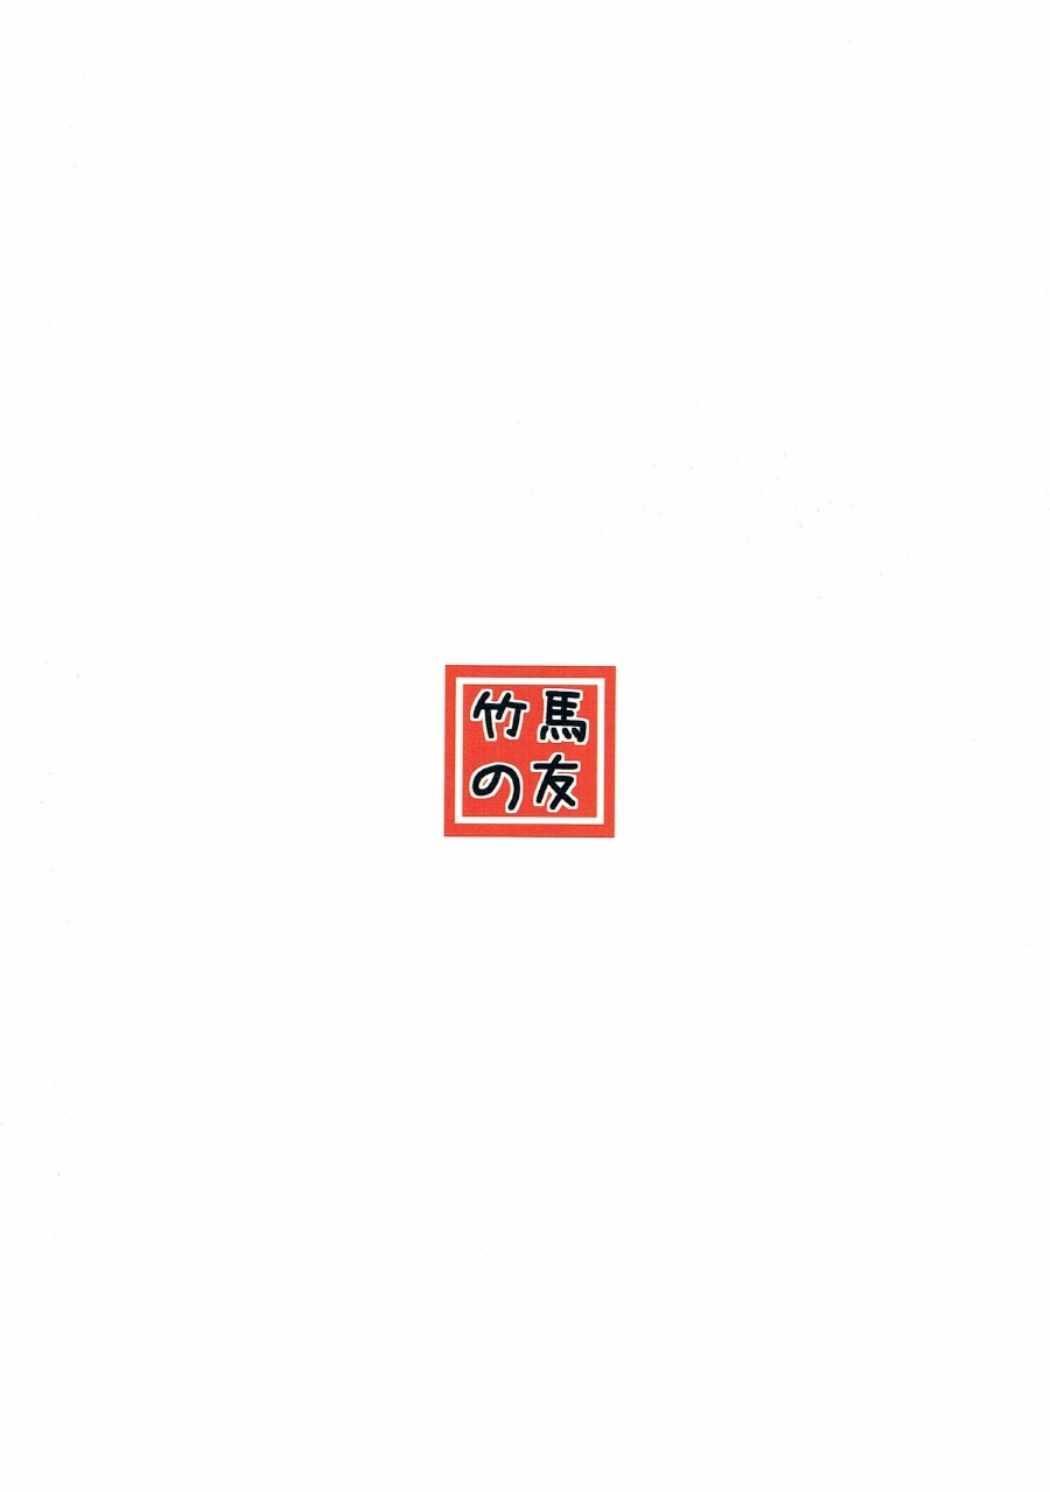 Producer-san... Onegaishimasu. 25